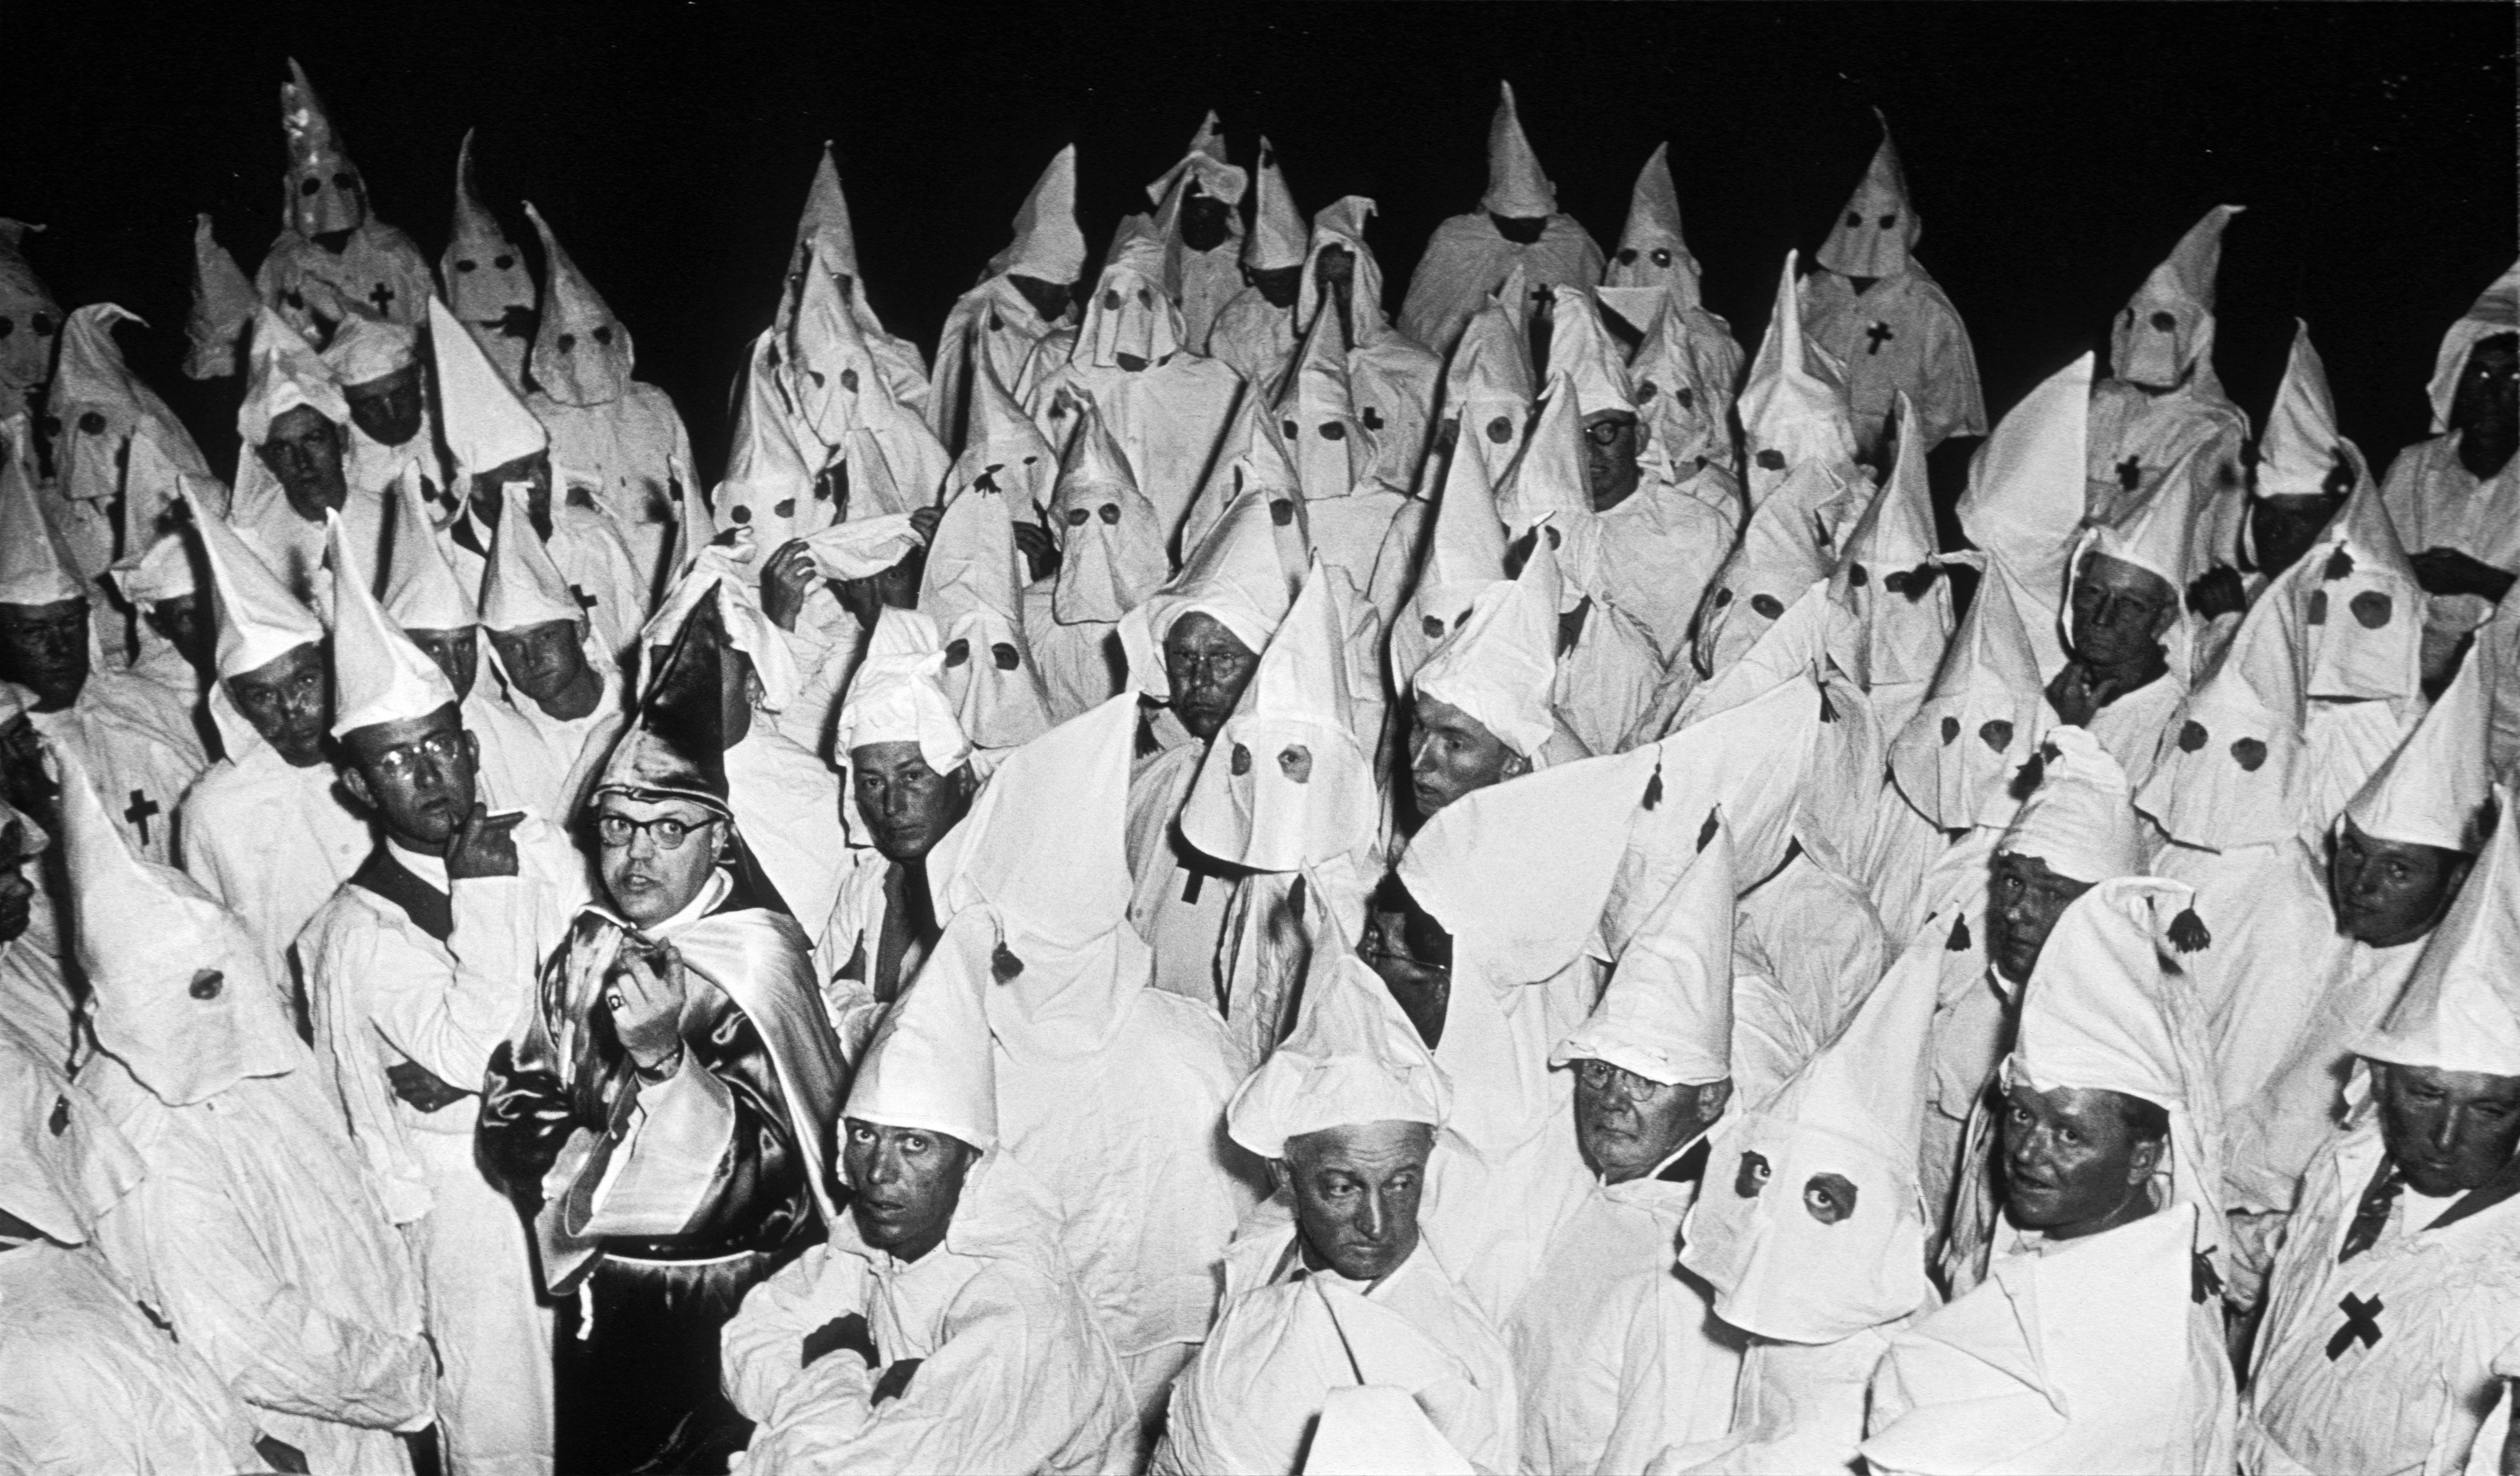 Ku Klux Klan (KKK) meeting, South Carolina, 1951.© Heirs of W. Eugene Smith